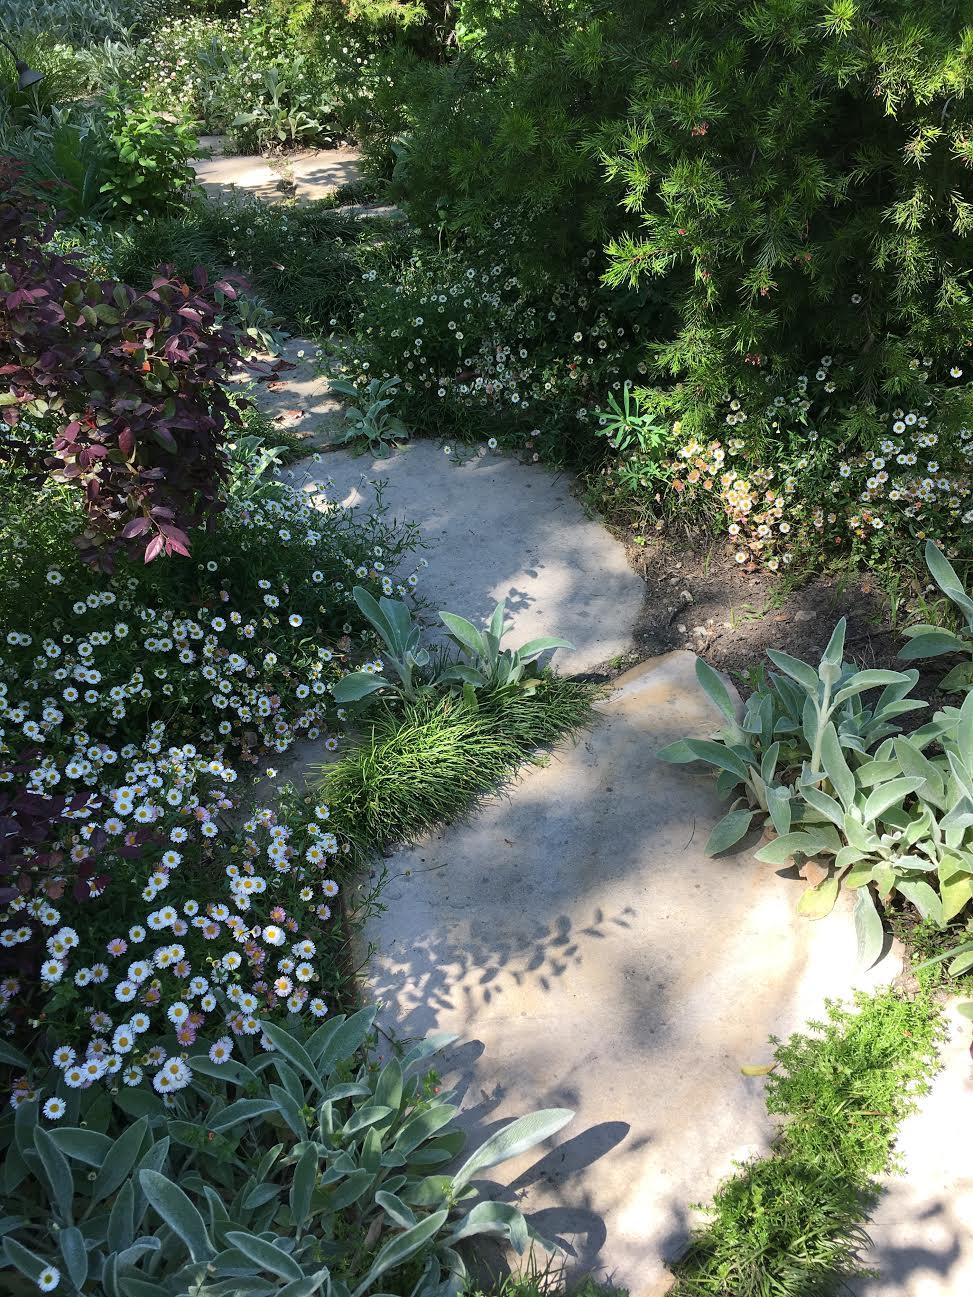 Erigeron Karvinskianis bordering the path